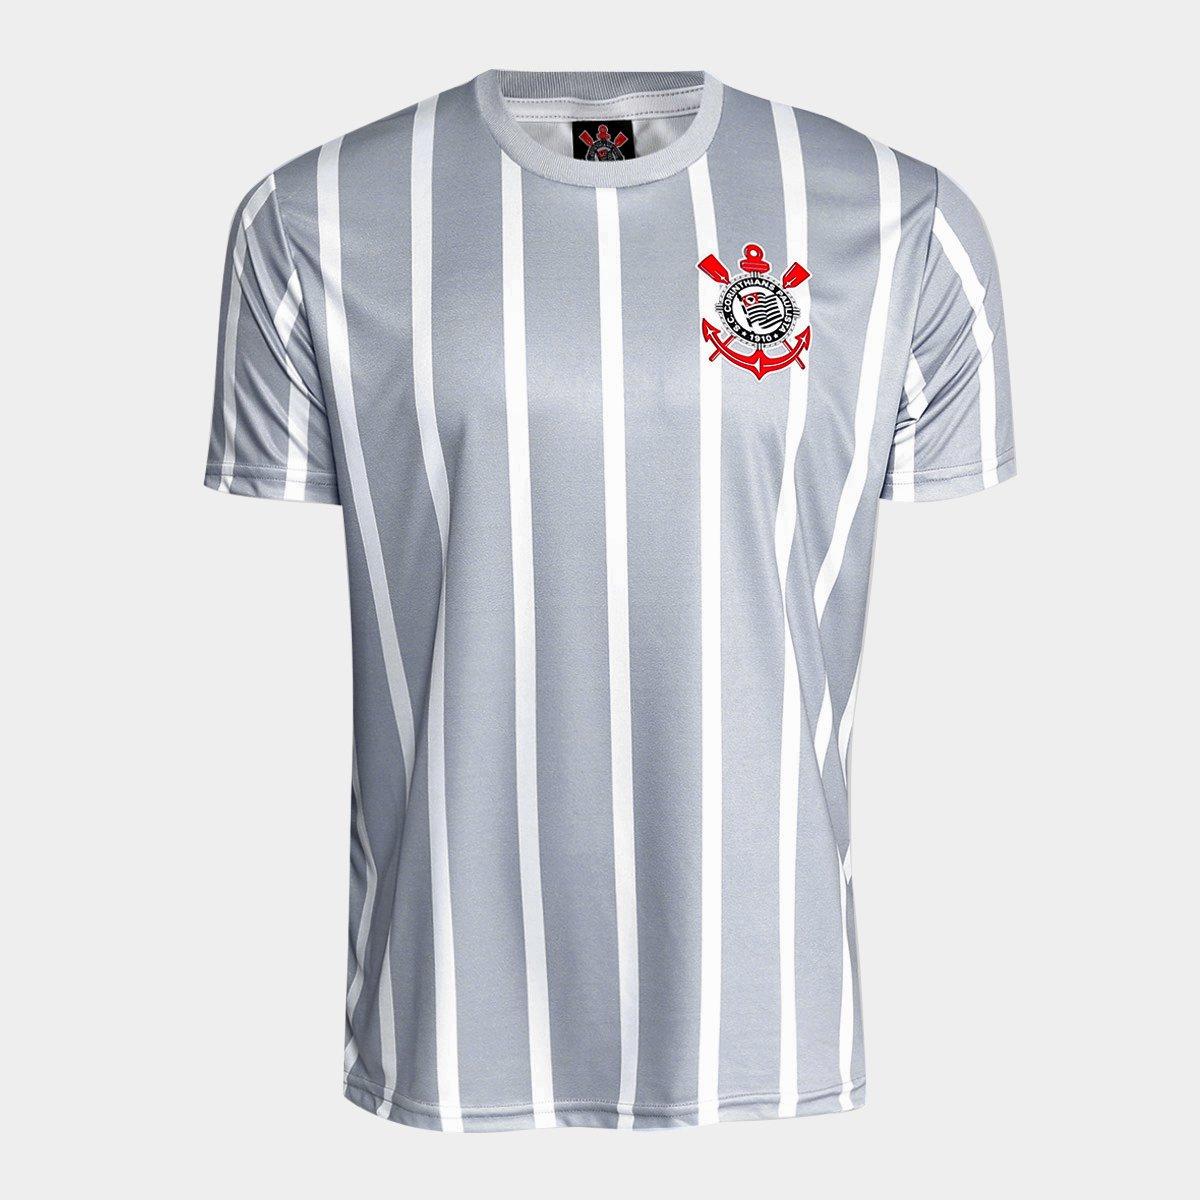 de8ddf0ab5 Shopping Smiles - Camisa Corinthians 2002 n° 7 Masculina